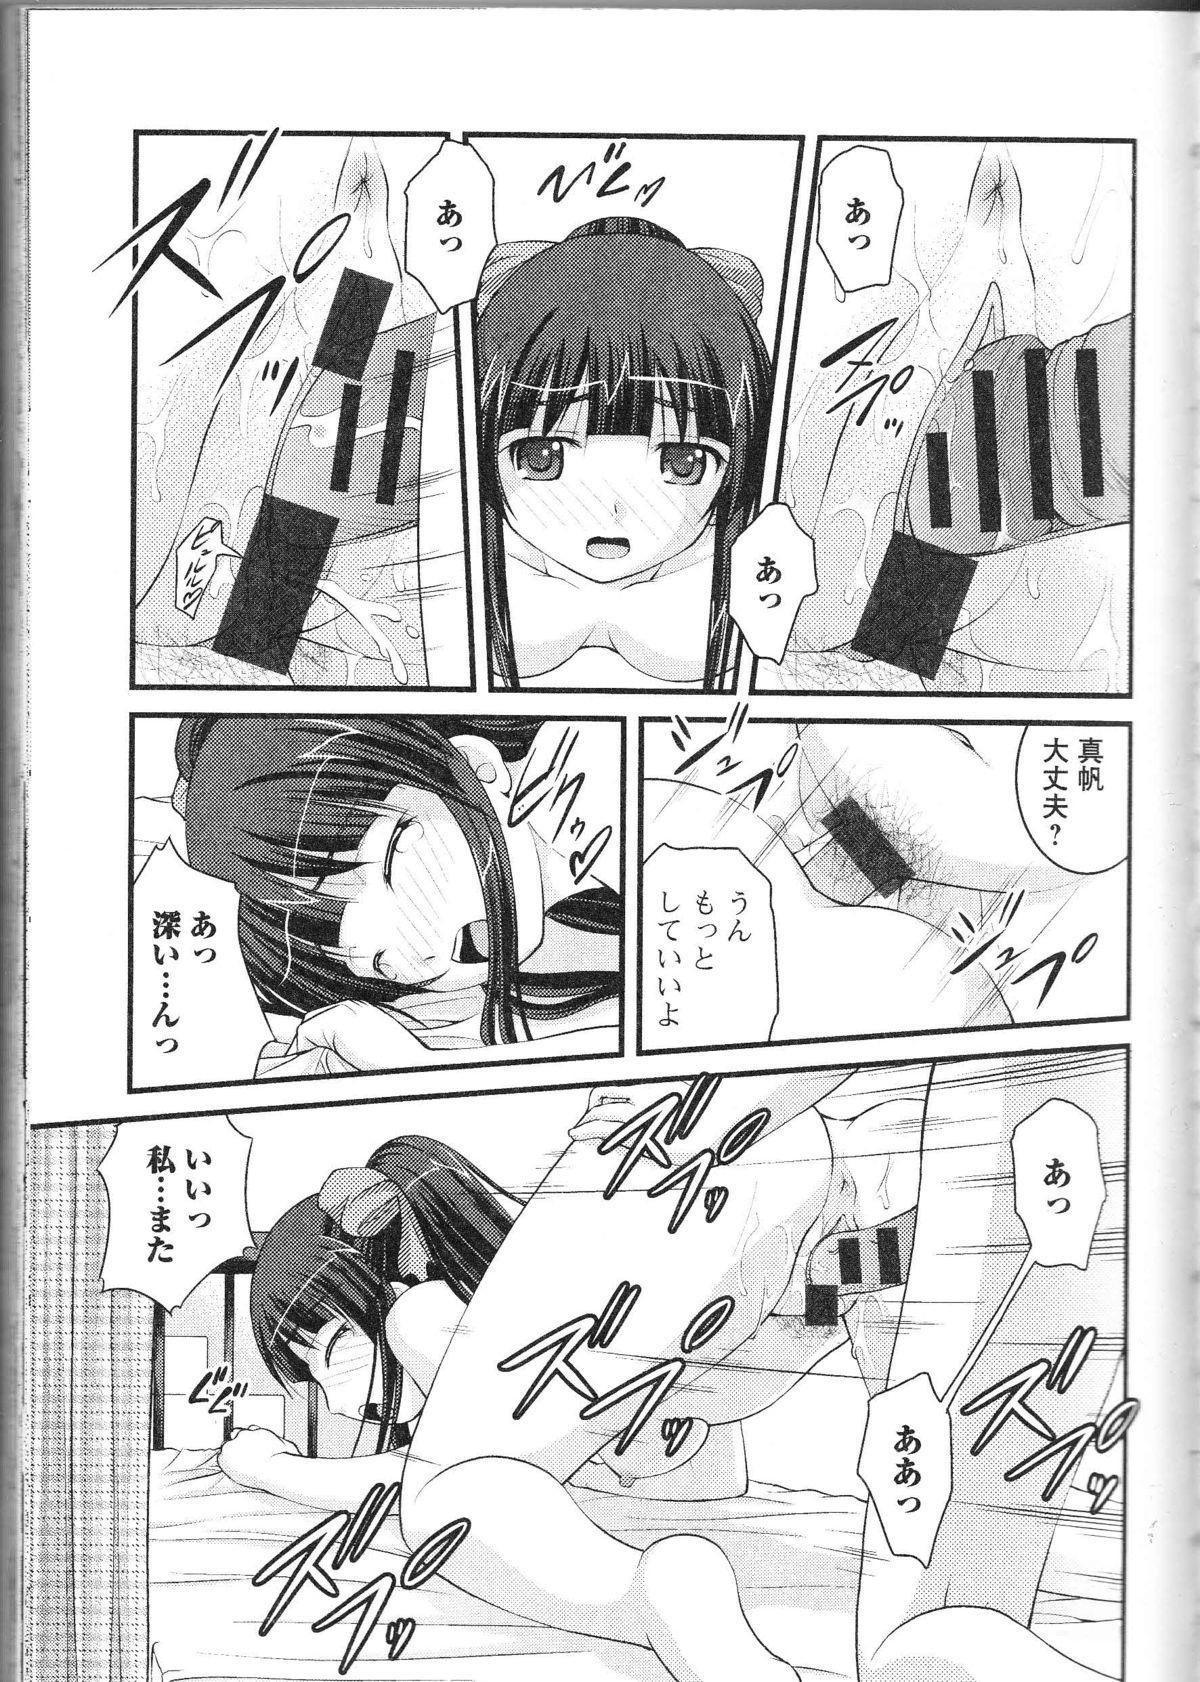 Nozoite wa Ikenai 9 - Do Not Peep! 9 21